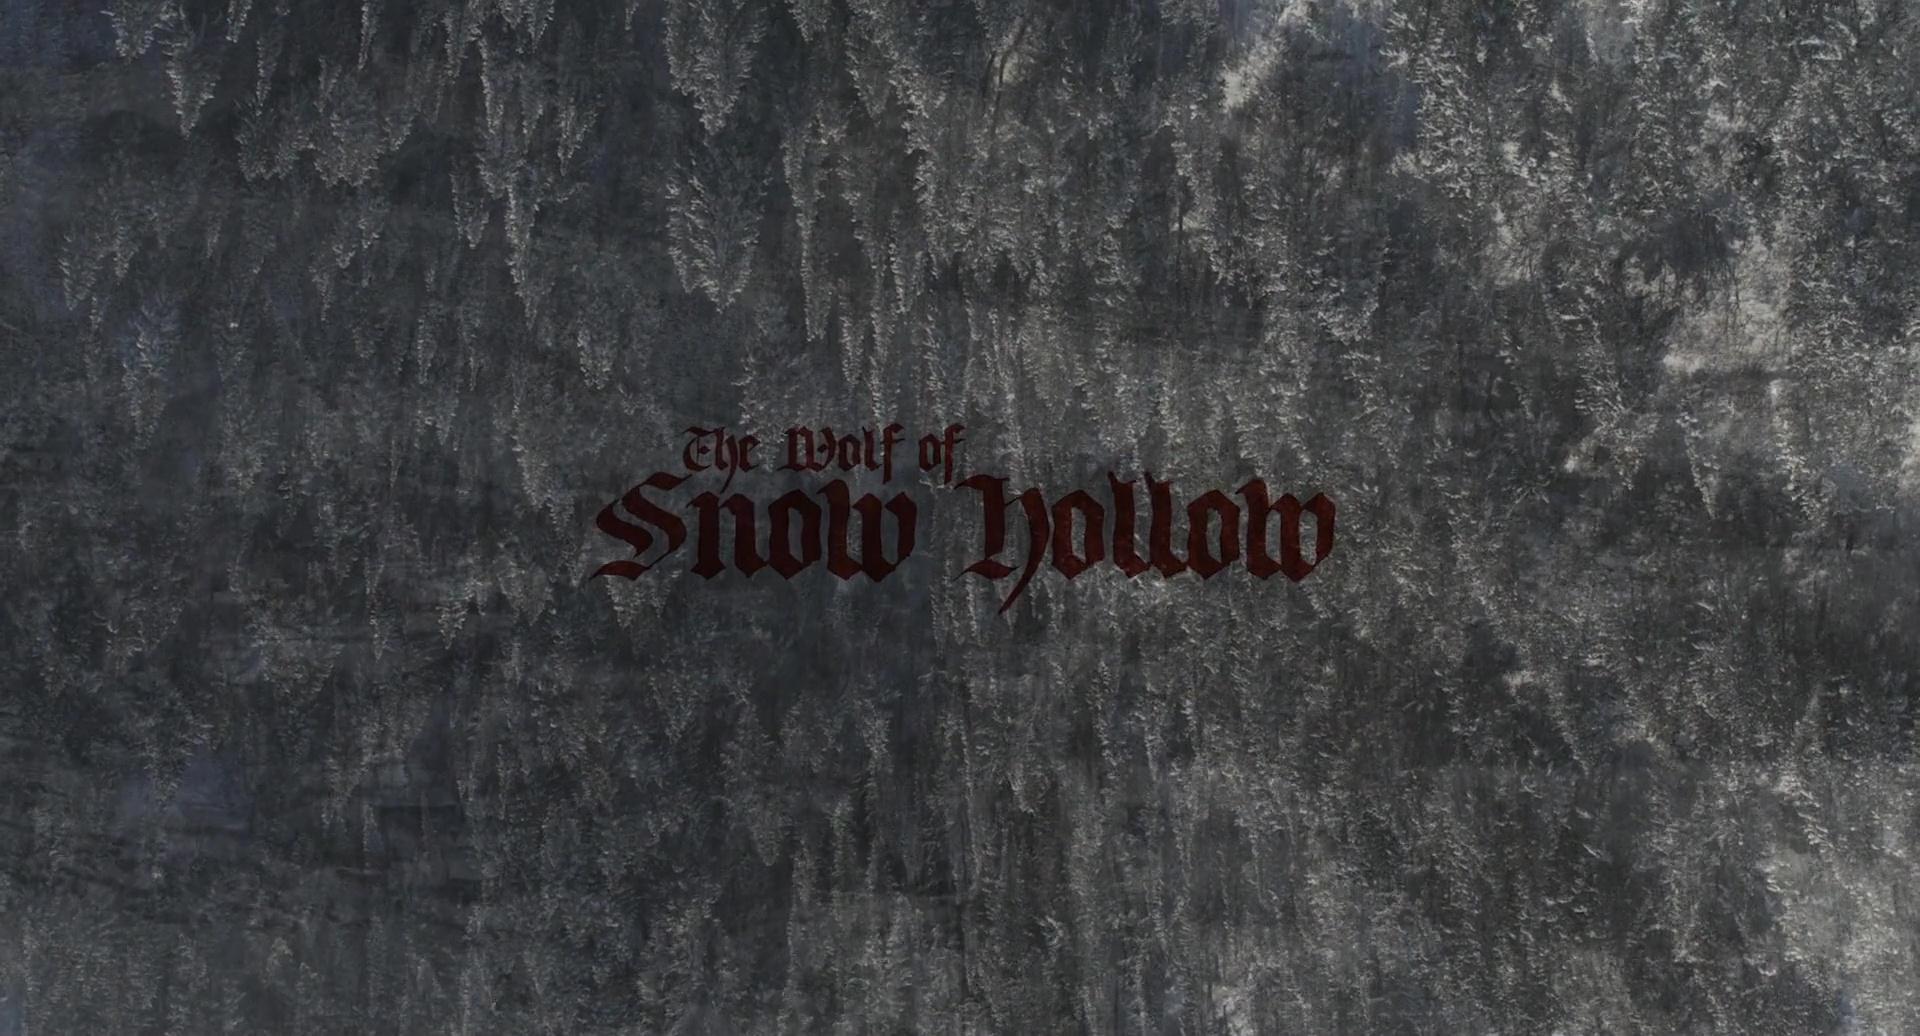 THE WOLF OF SNOW HOLLOW de Jim Cummings (2020)